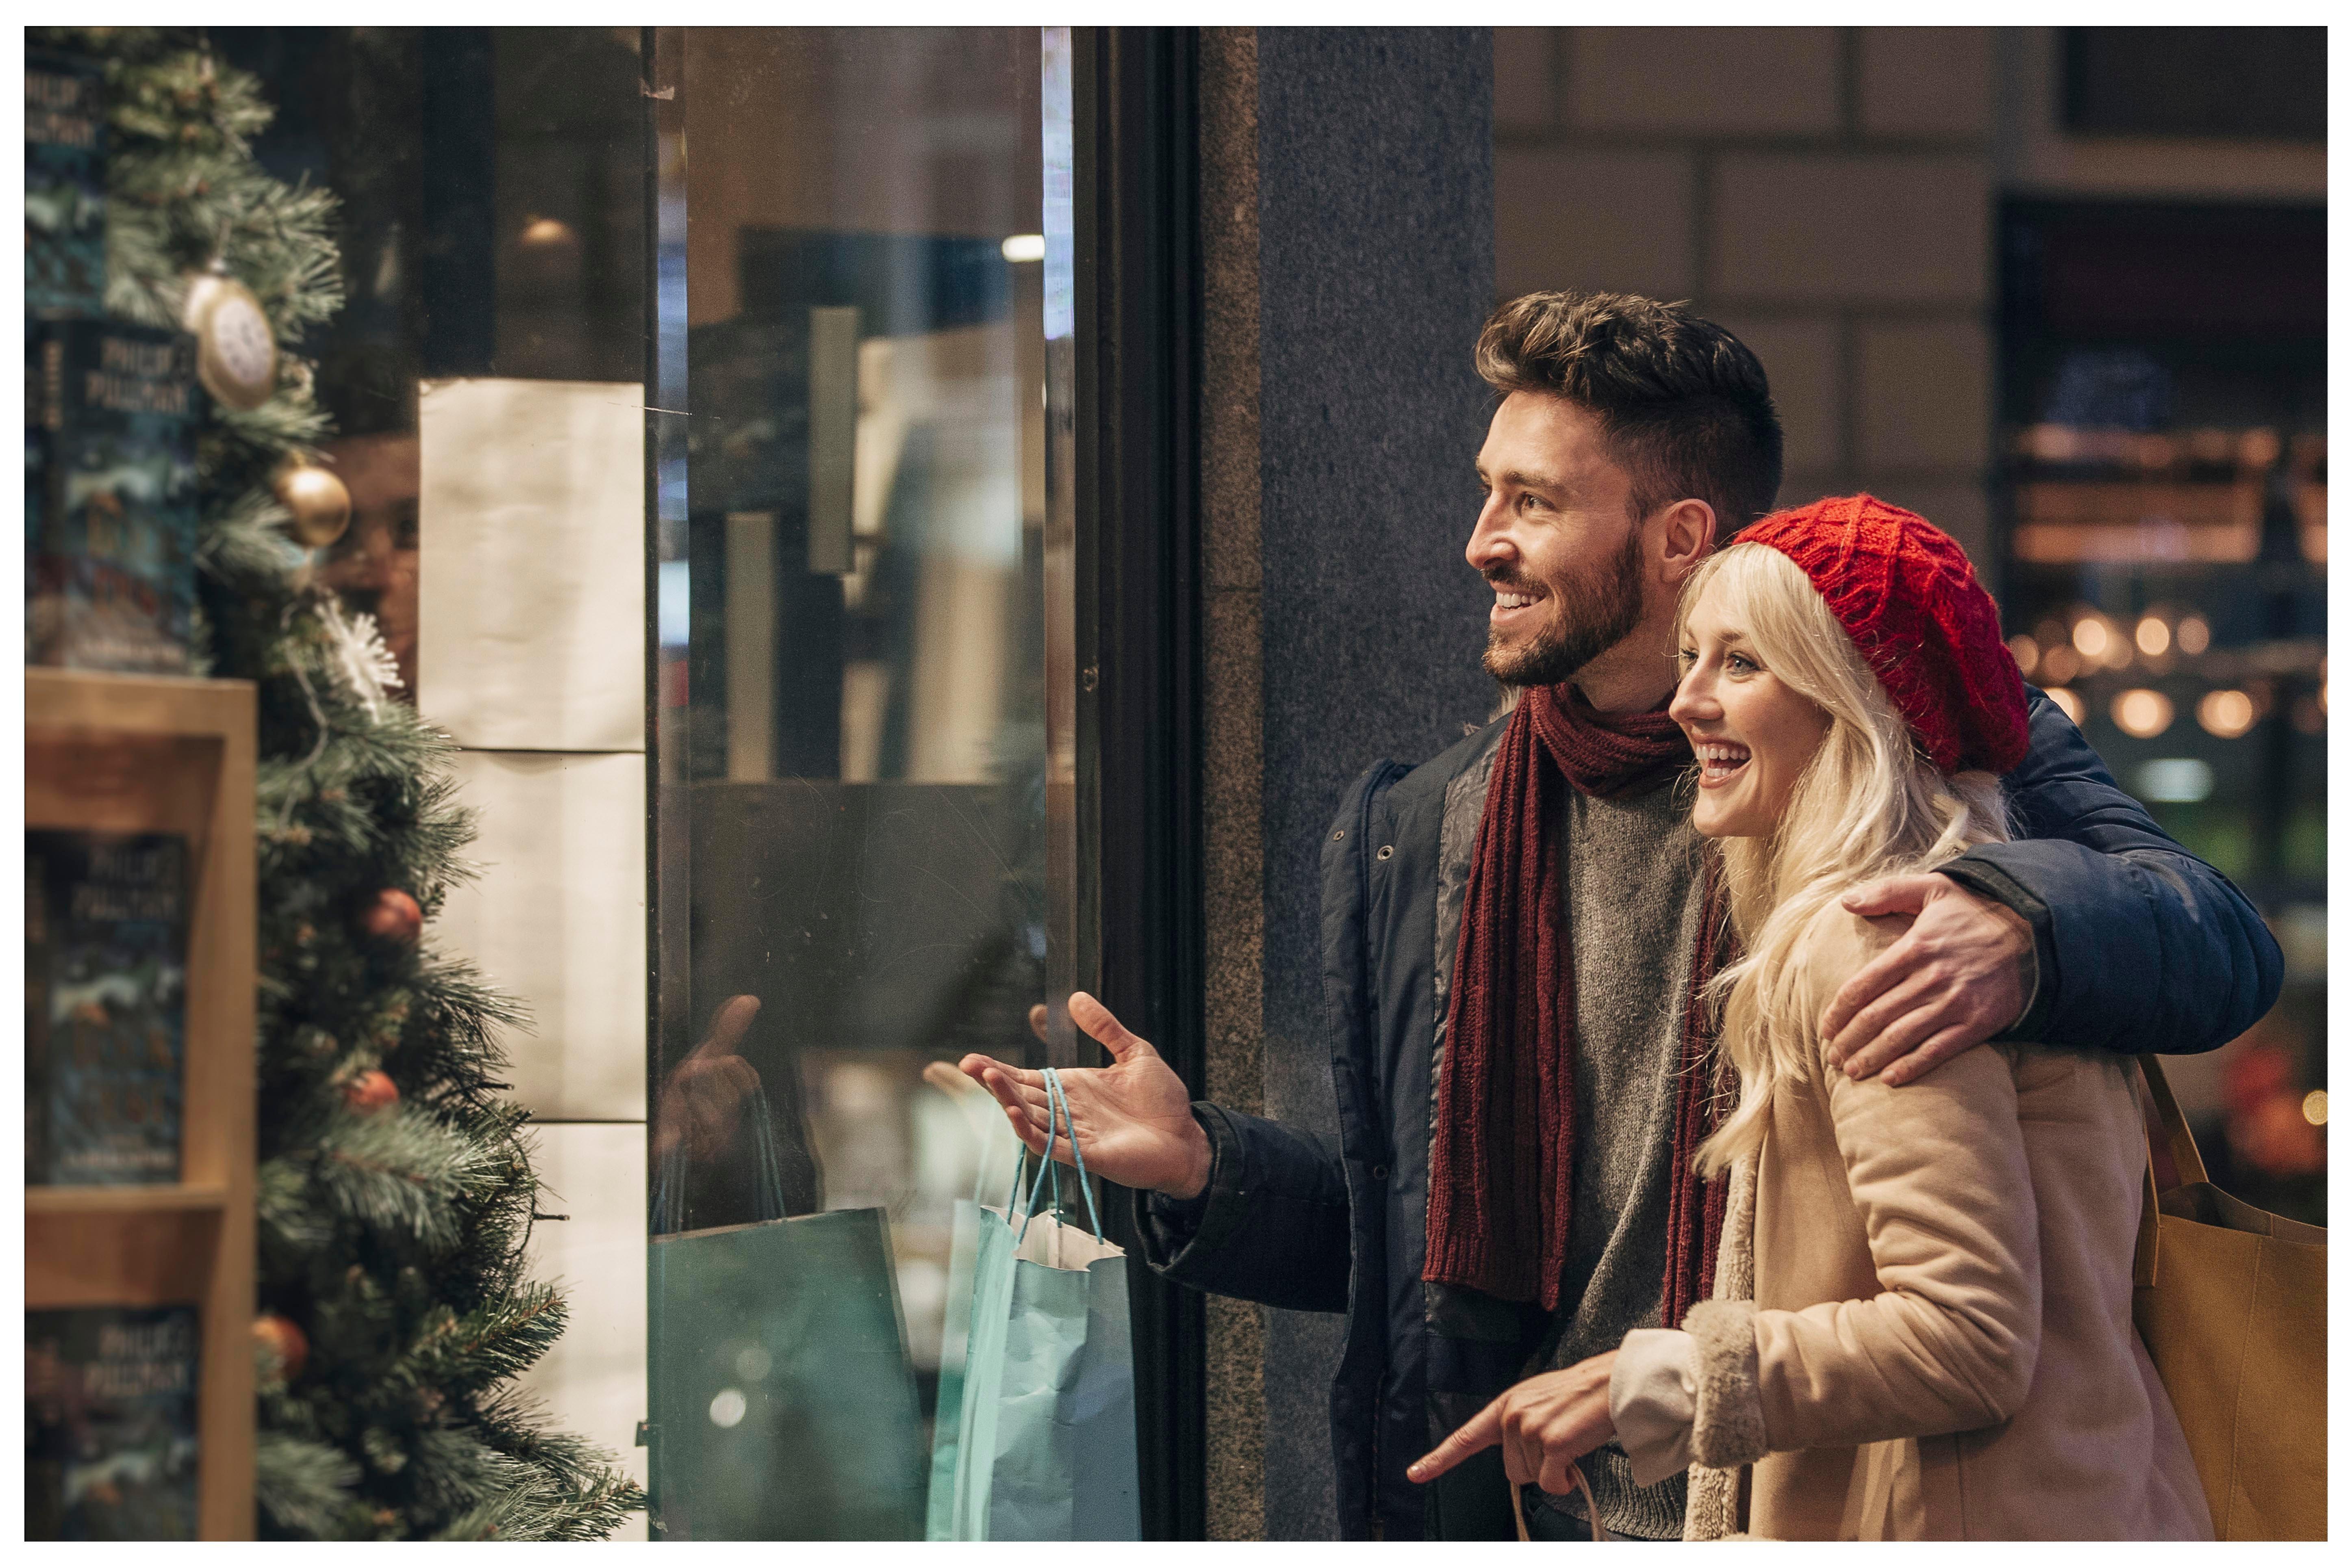 CVB_Christmas-shopping-2_c